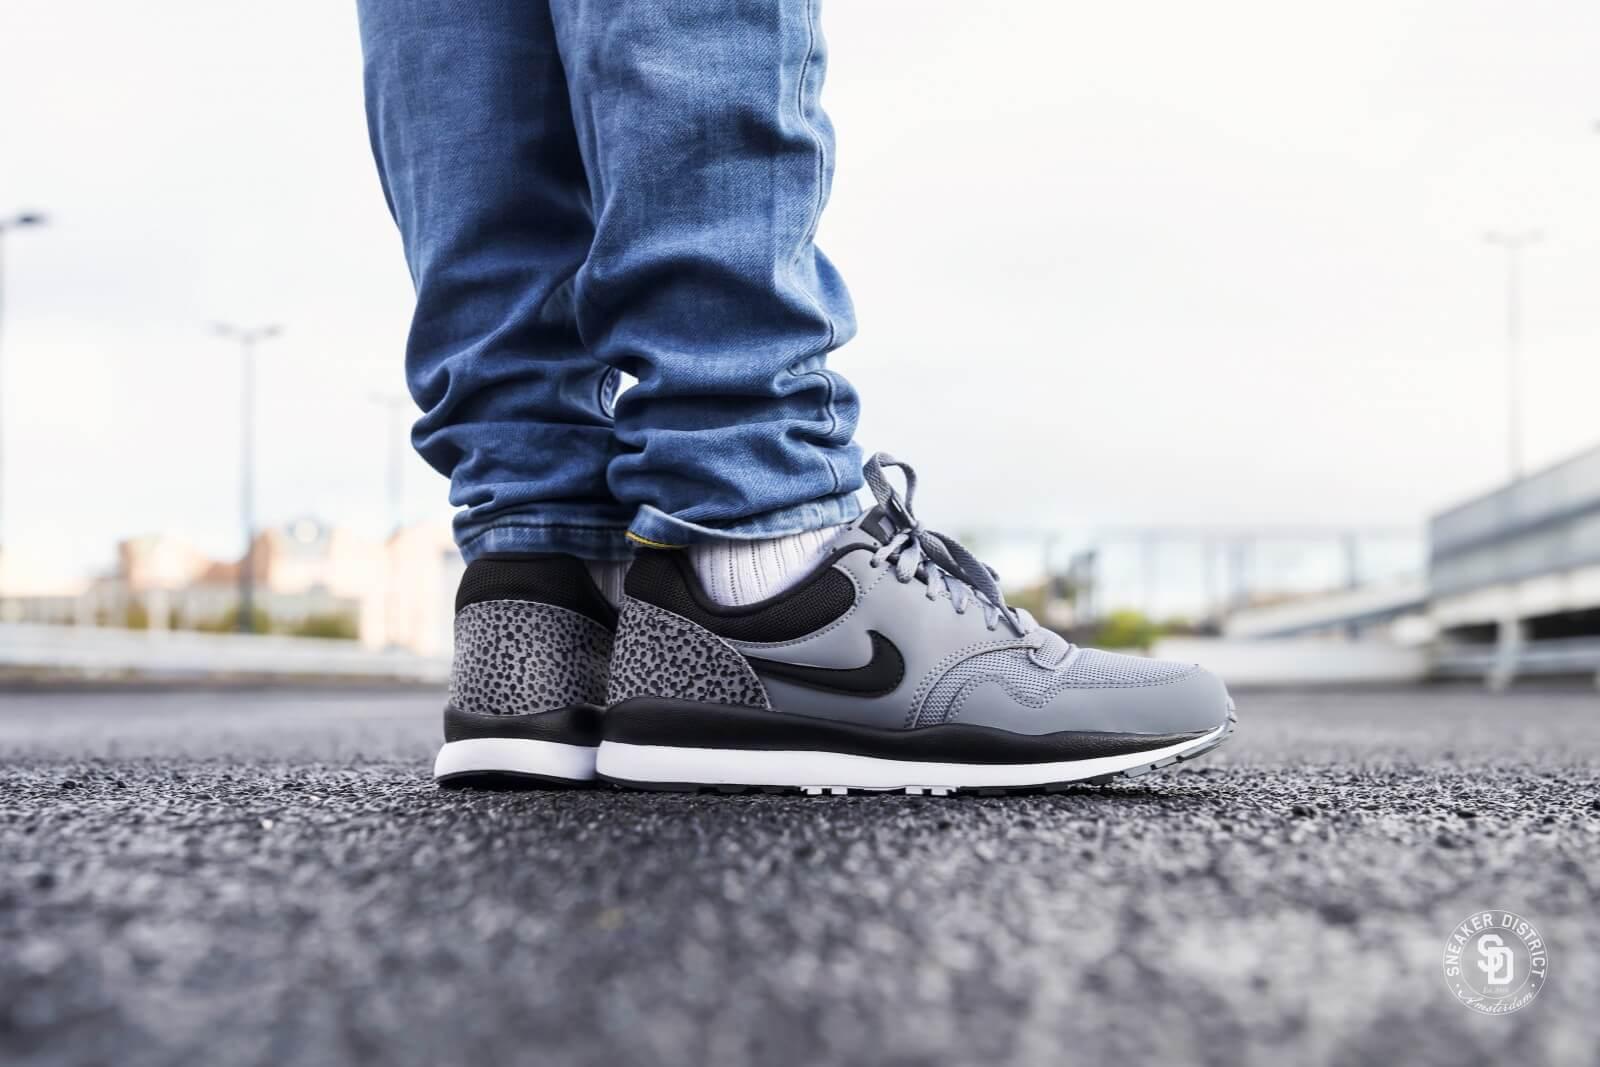 Nike Air Safari Cool Greyblack white 371740 012